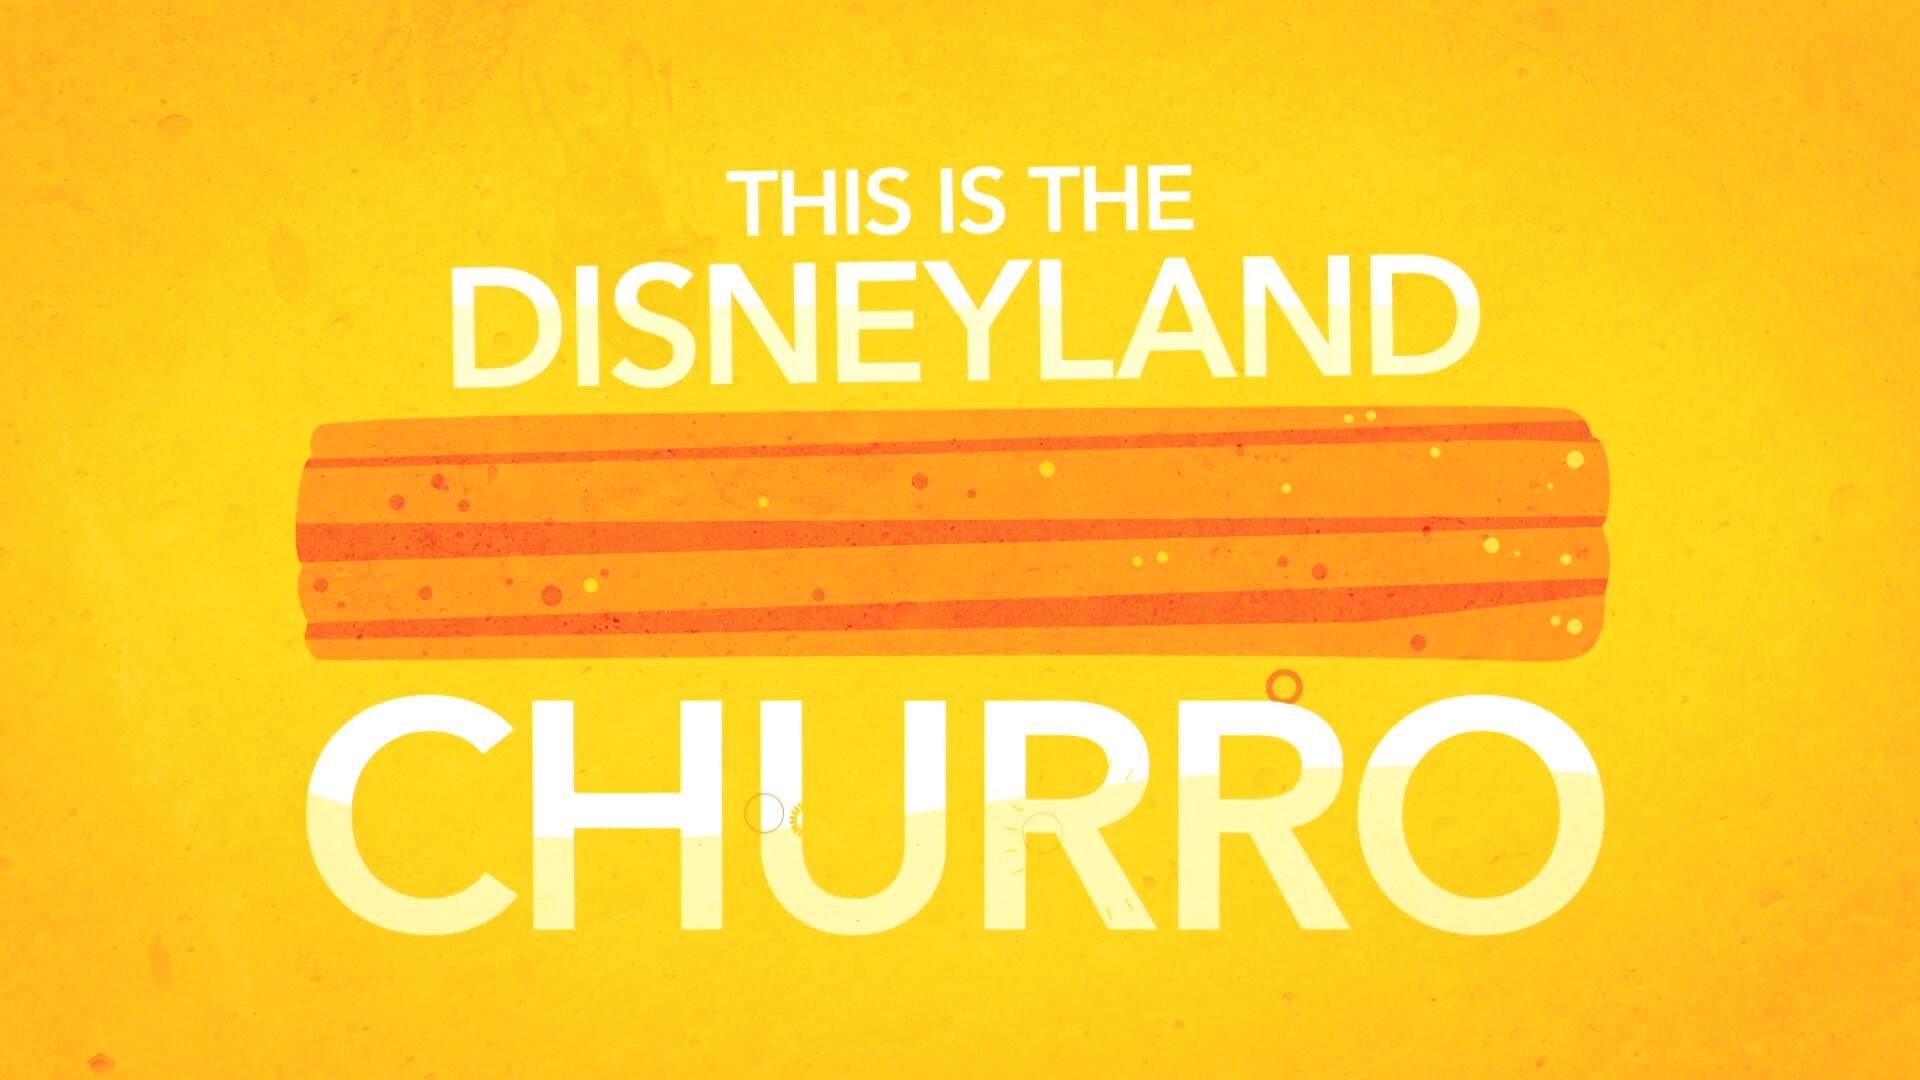 Disneyland Churro Facts